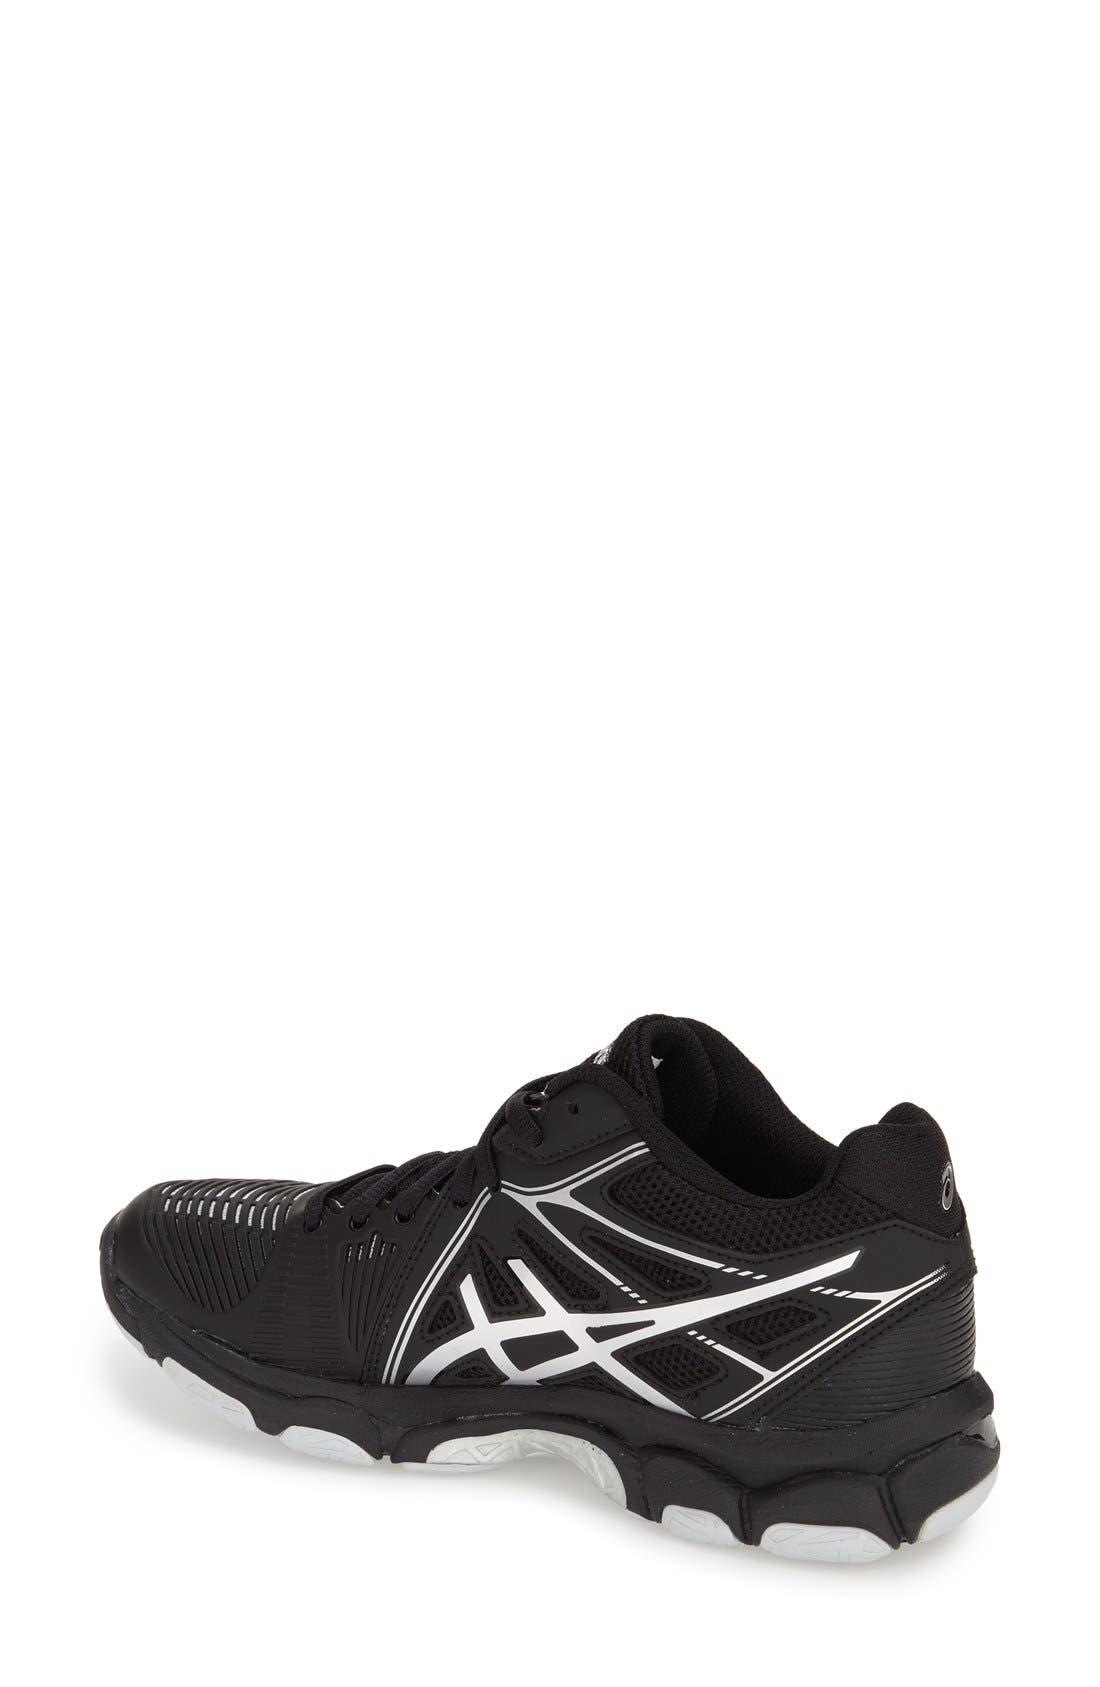 Alternate Image 2  - ASICS® 'GEL-Netburner' Mid Volleyball Shoe (Women)